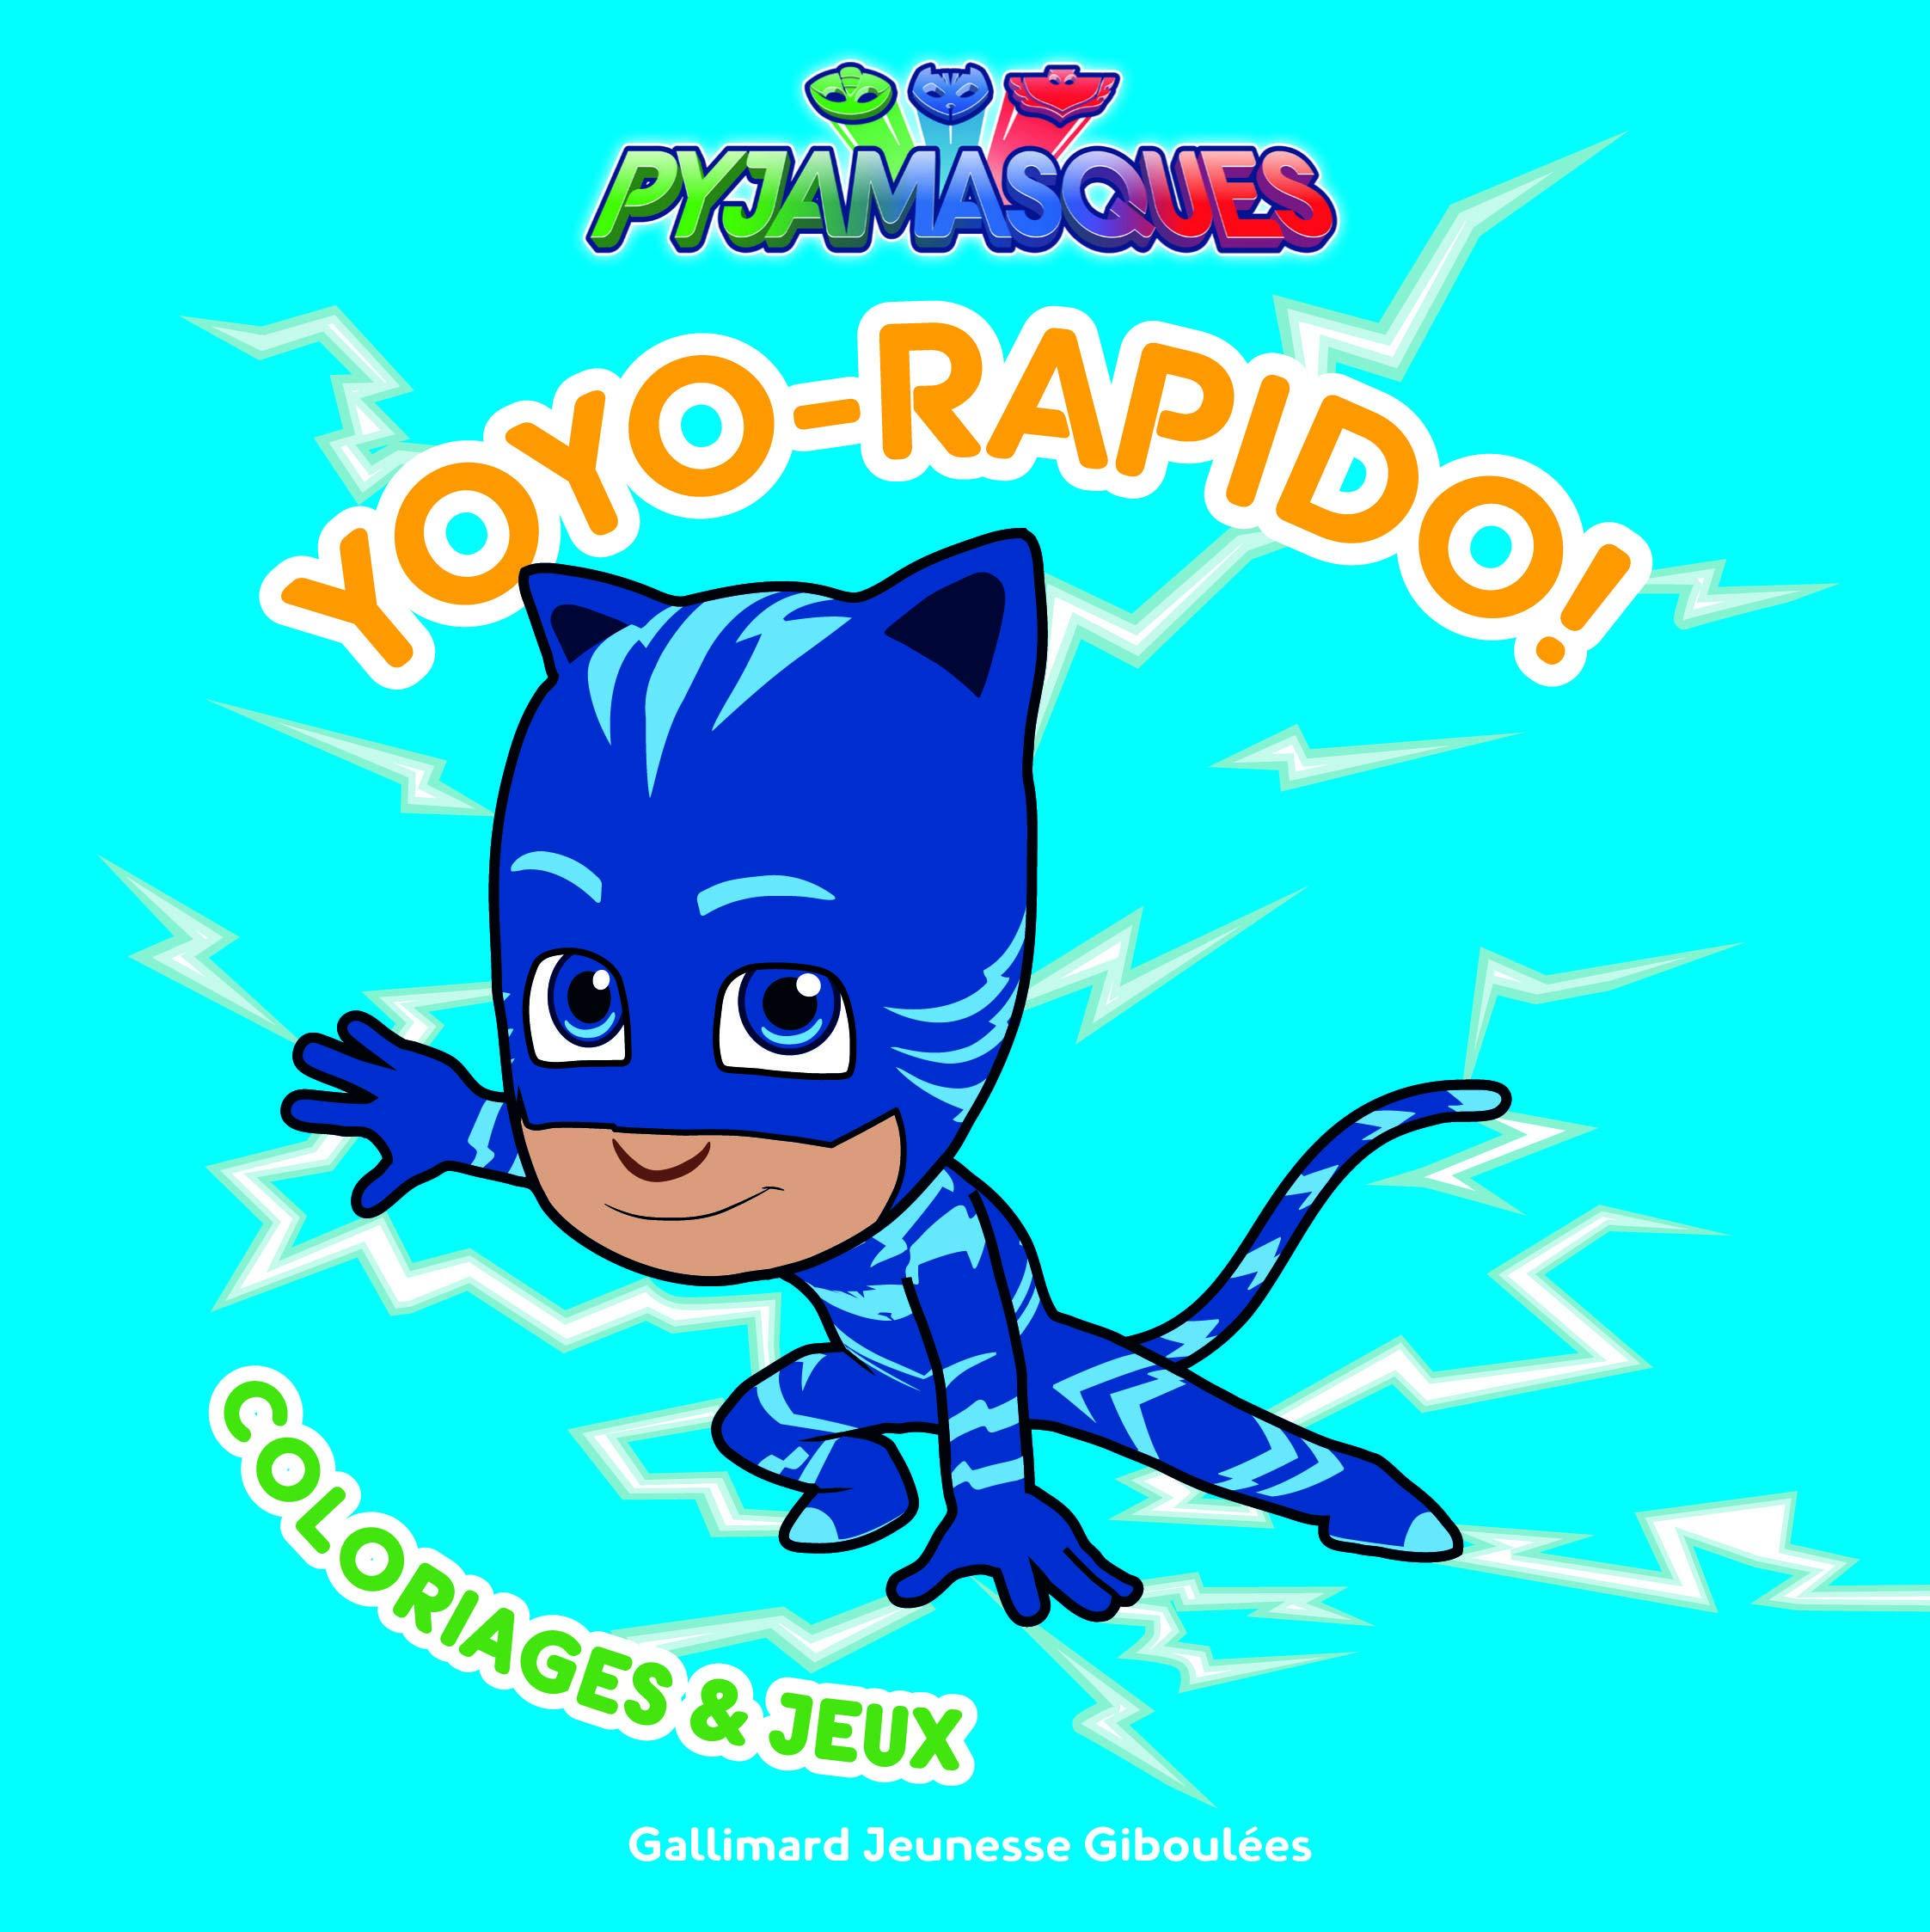 Yoyo Rapido Coloriages Et Jeux Series Tv French Edition Romuald 9782075096829 Amazon Com Books